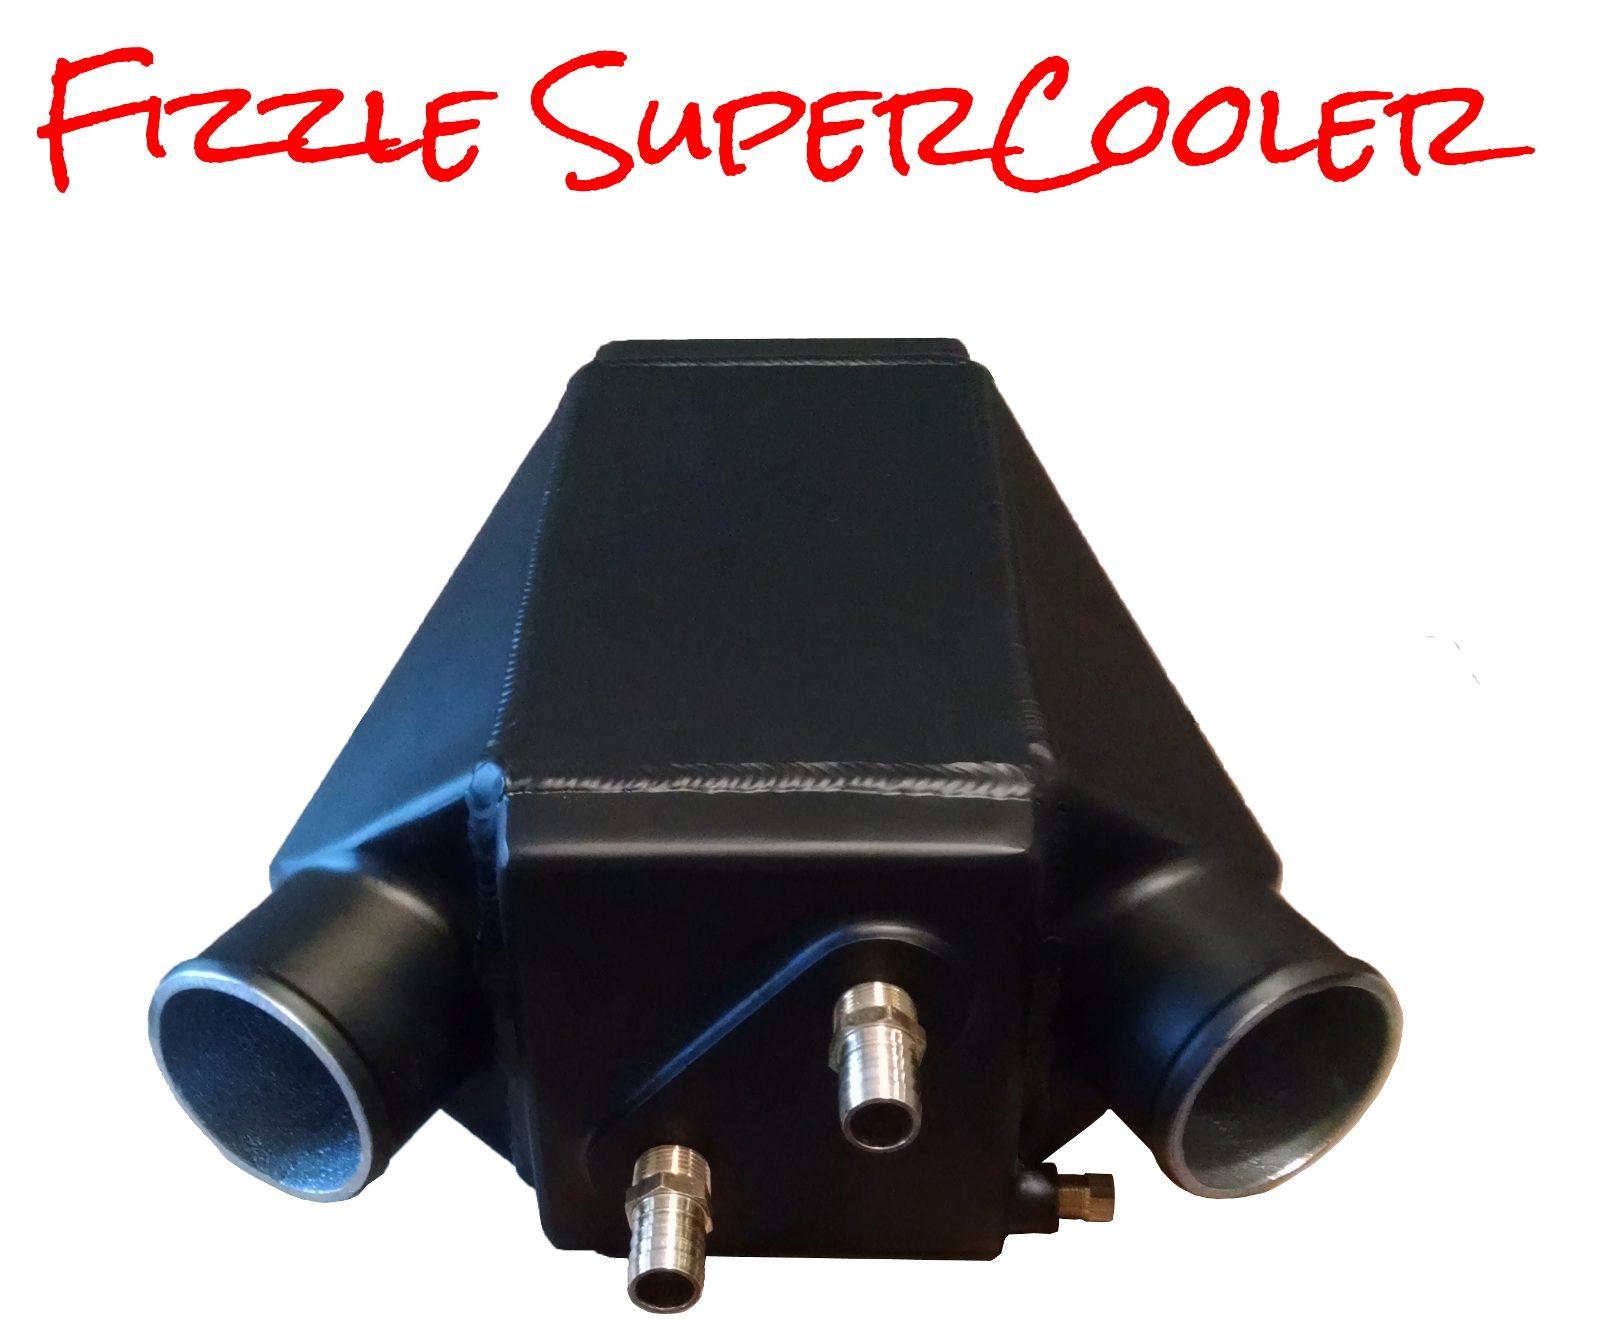 Fizzle supercooler for seadoo 300 2016+